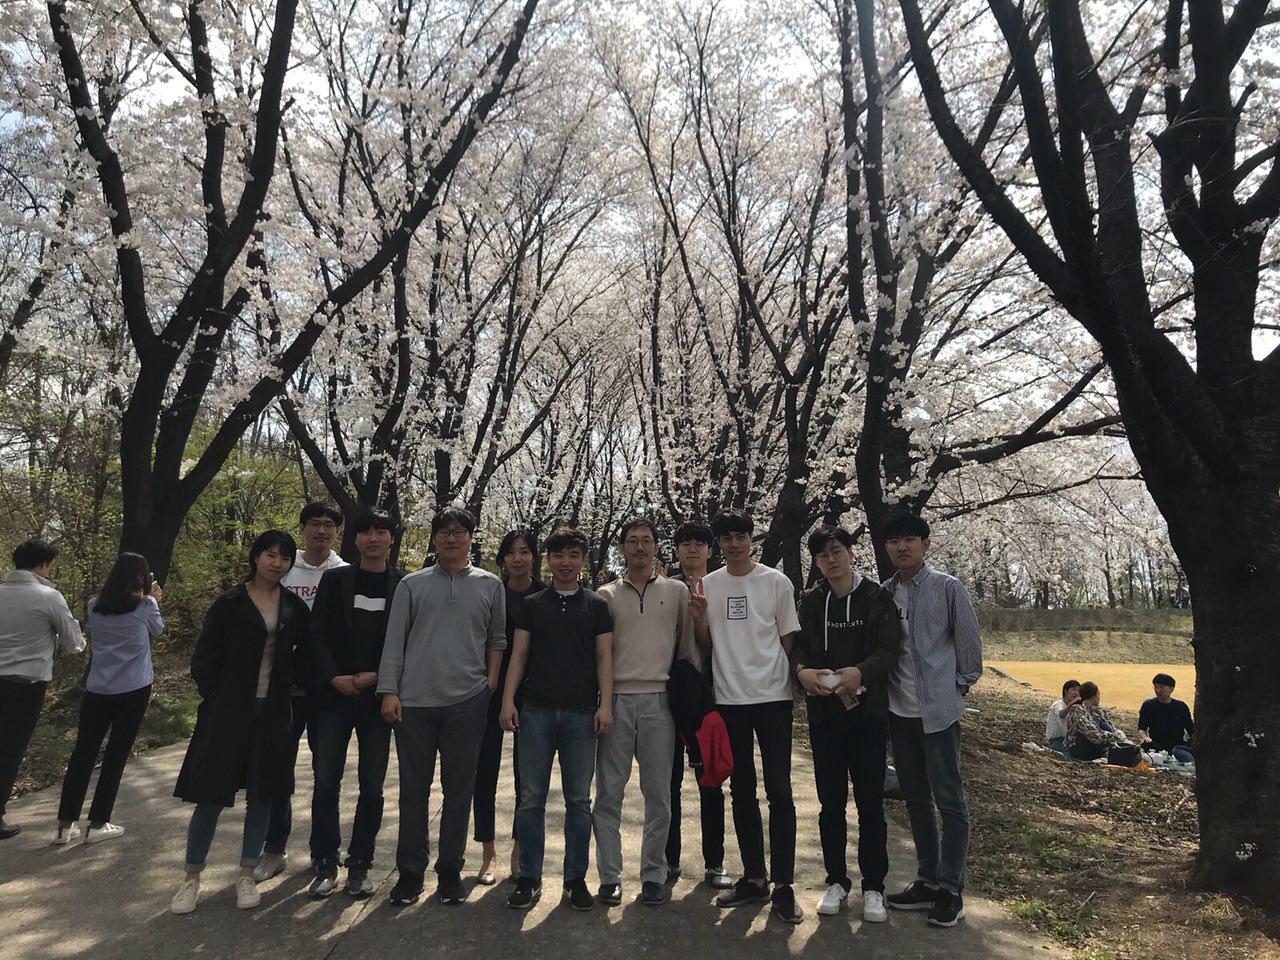 photo_2018-04-26_14-29-46.jpg